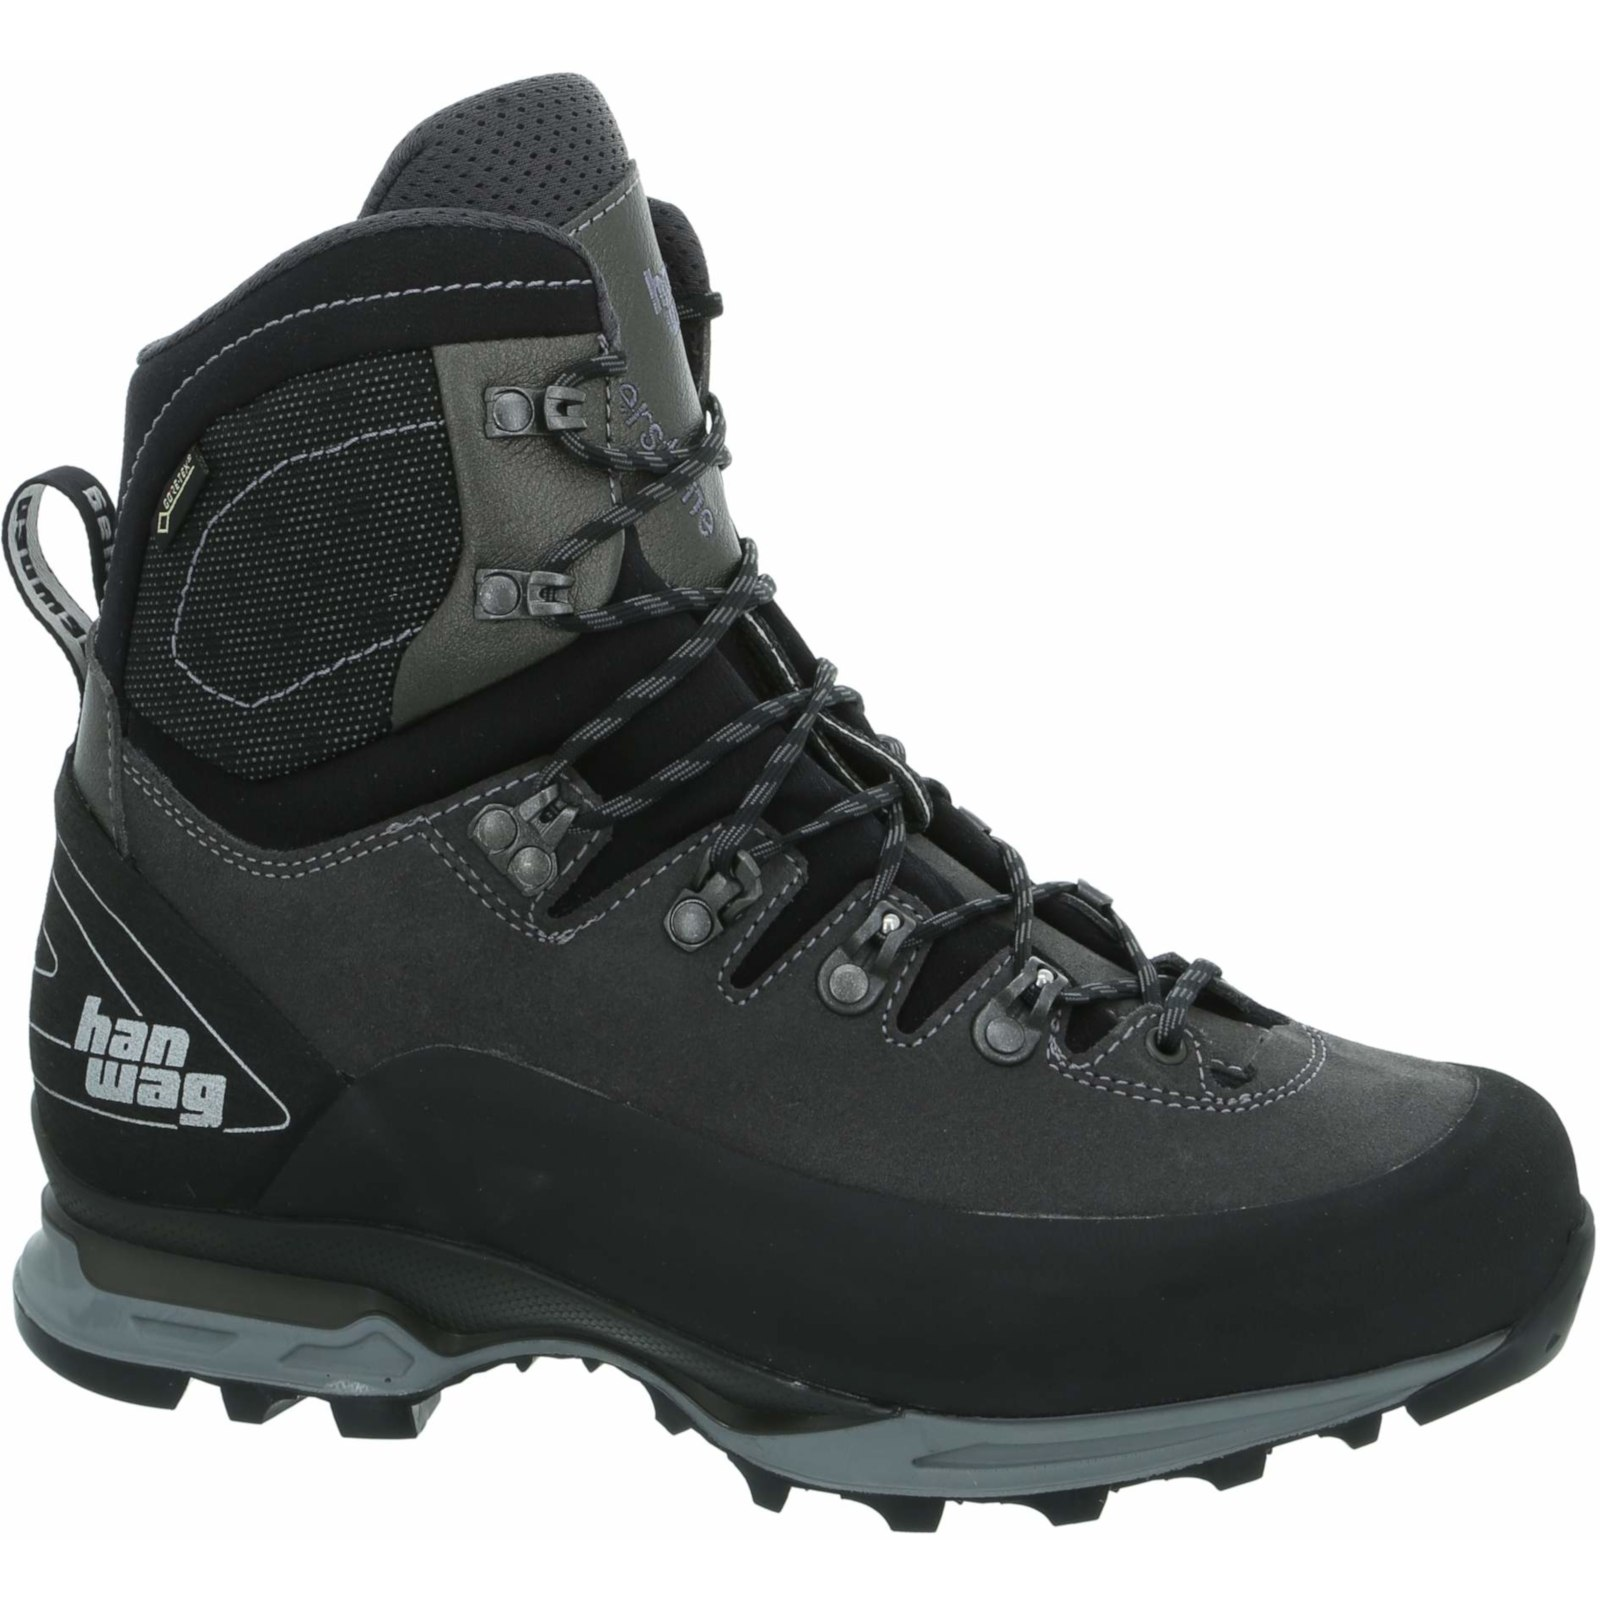 Hanwag Alverstone II GTX Shoe - Asphalt/Light Grey